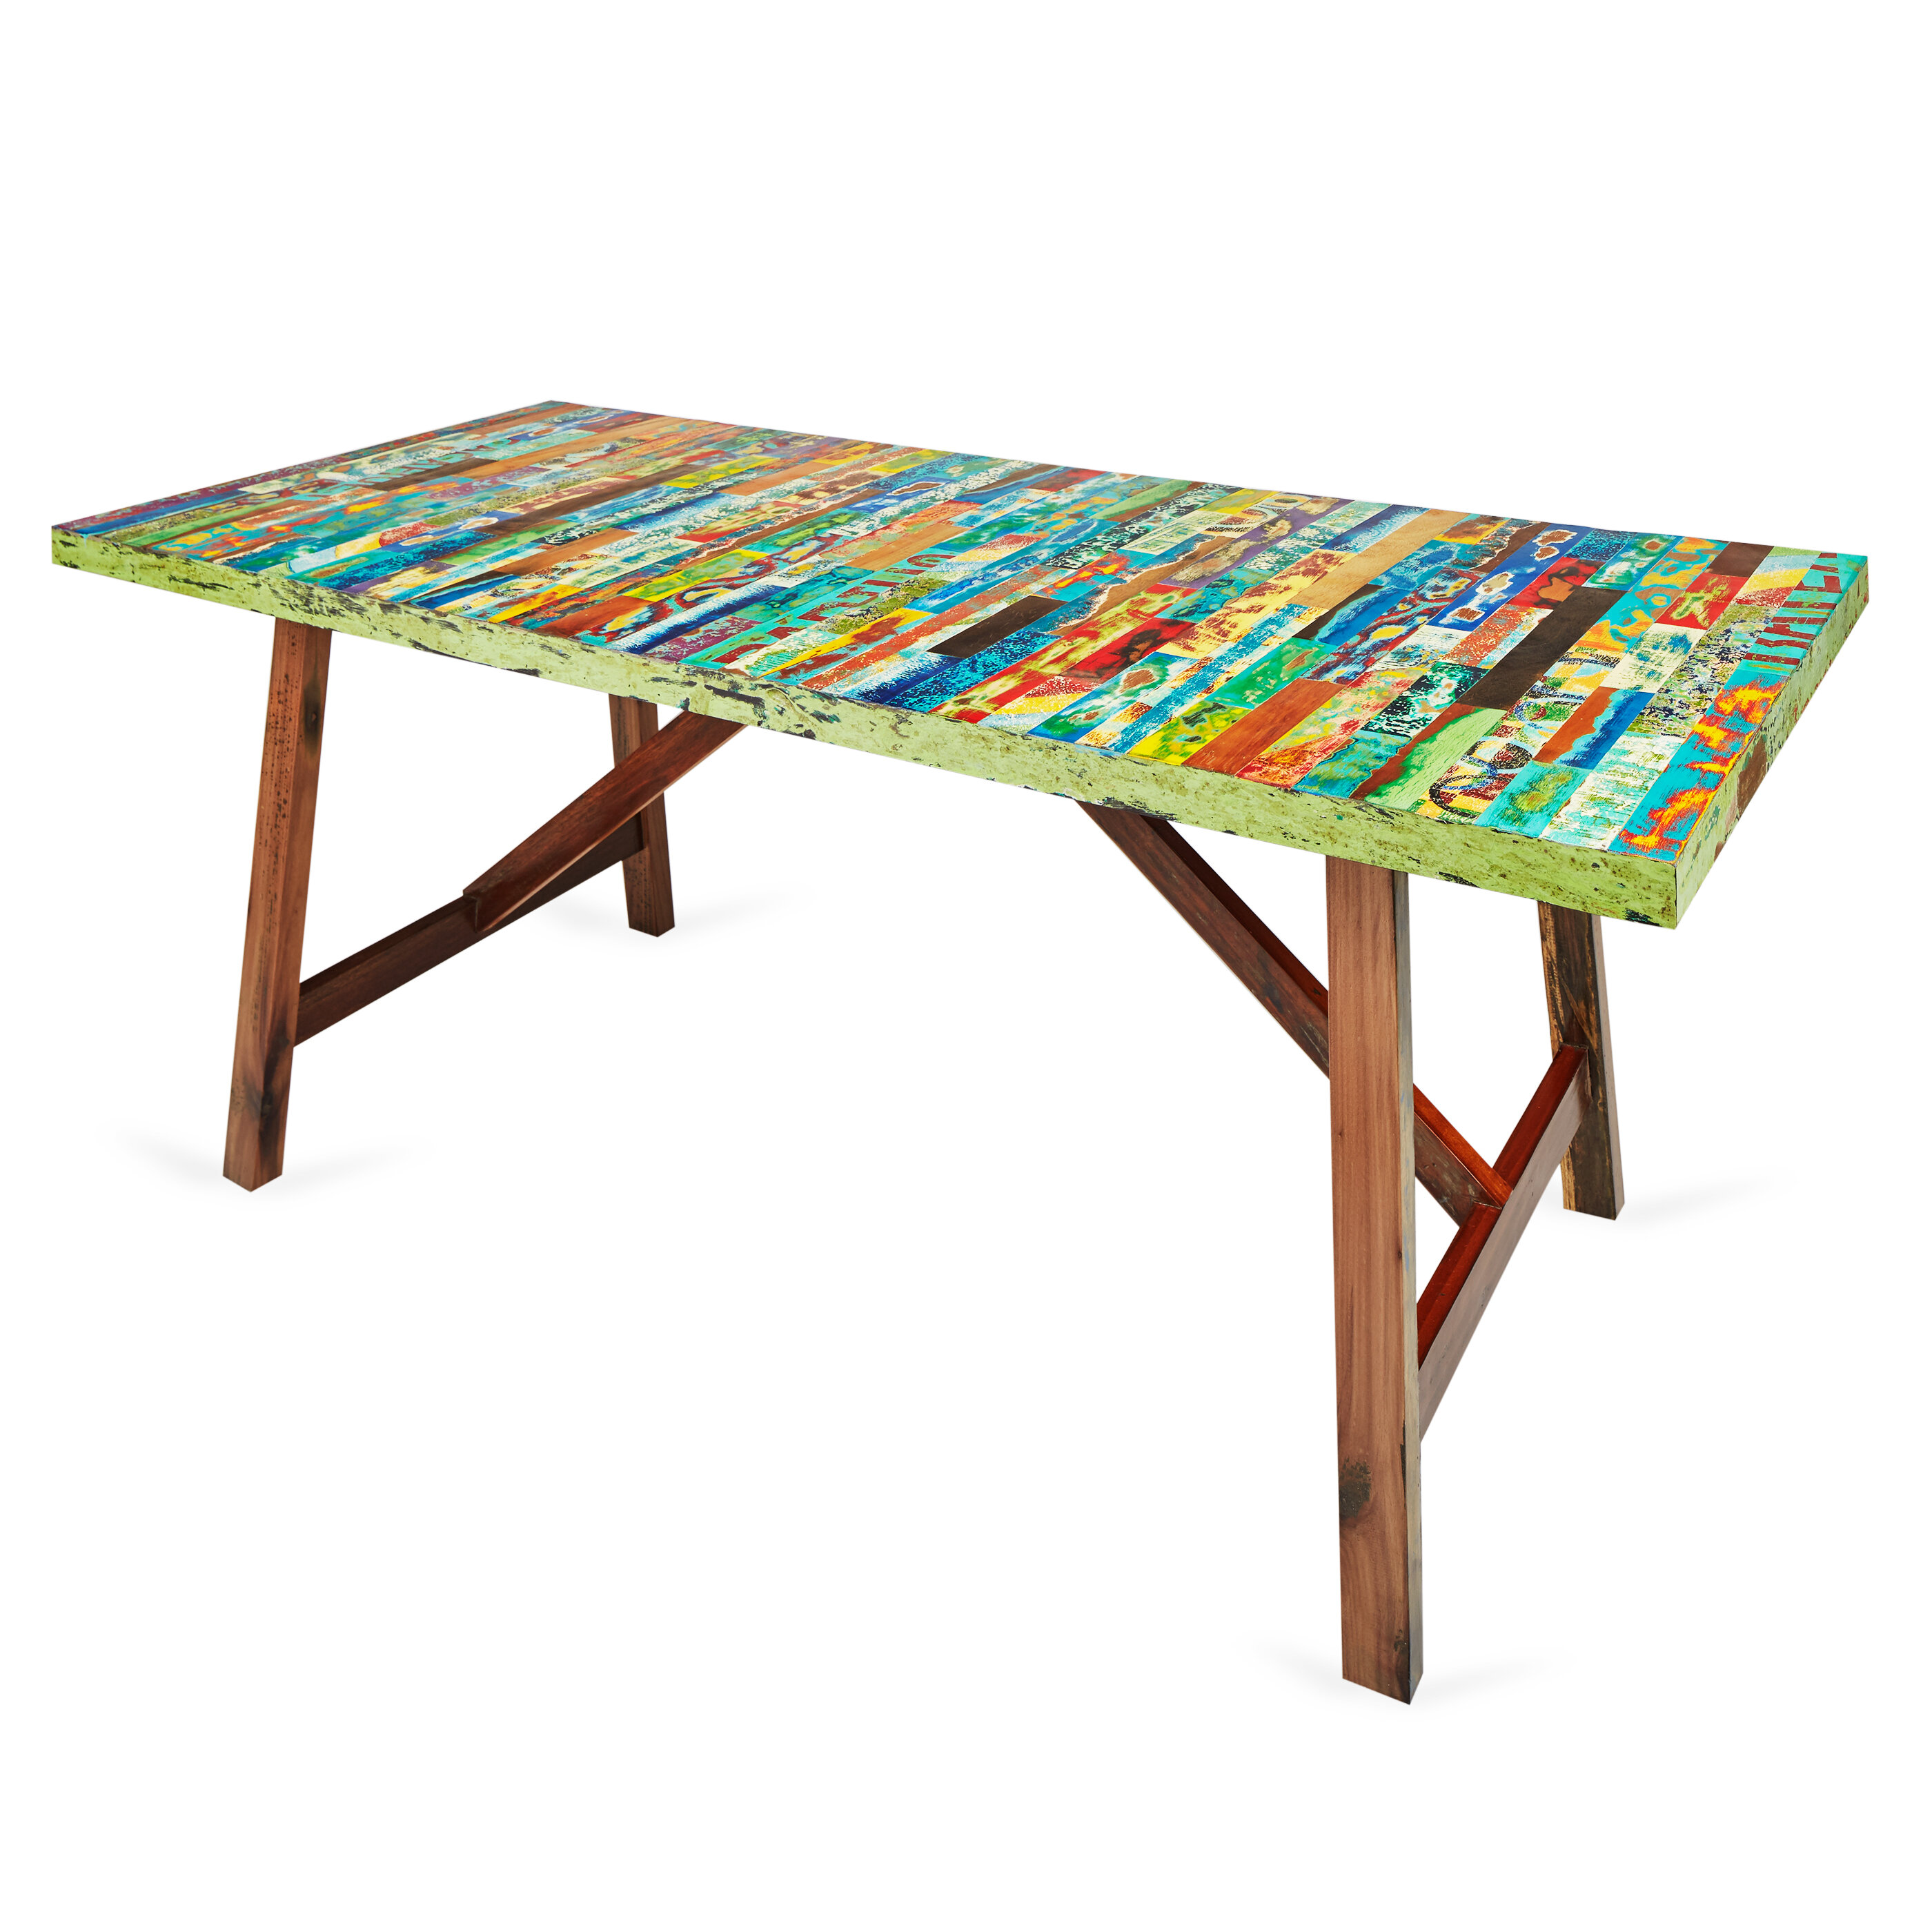 EcoChic Lifestyles Buoy Crazy Dining Table U0026 Reviews | Wayfair